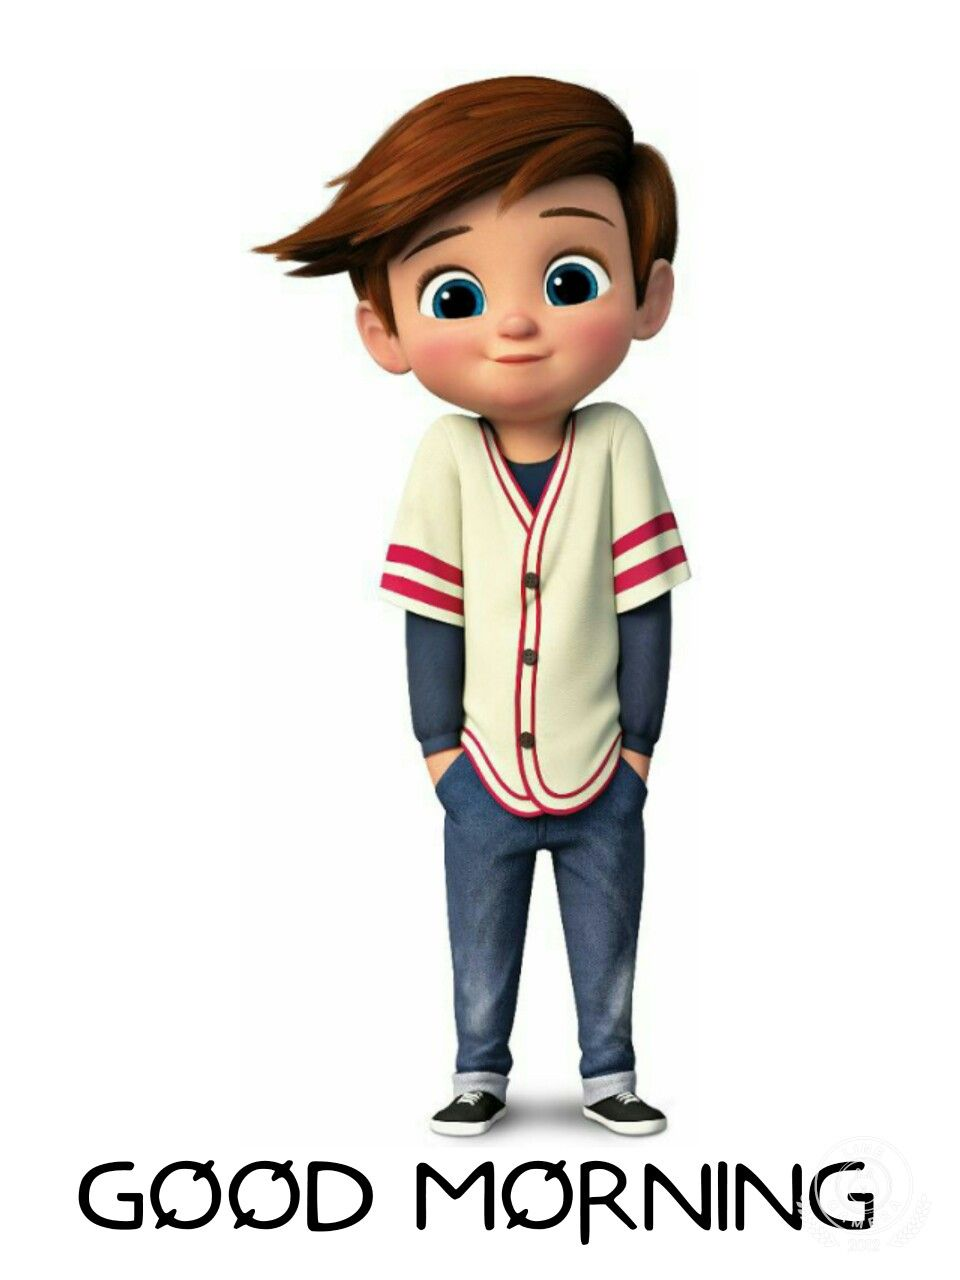 Hhhhhhhh H Baby Cartoon Drawing Cartoon Wallpaper Hd Cute Cartoon Boy Handsome boy wallpaper hd cartoon boy